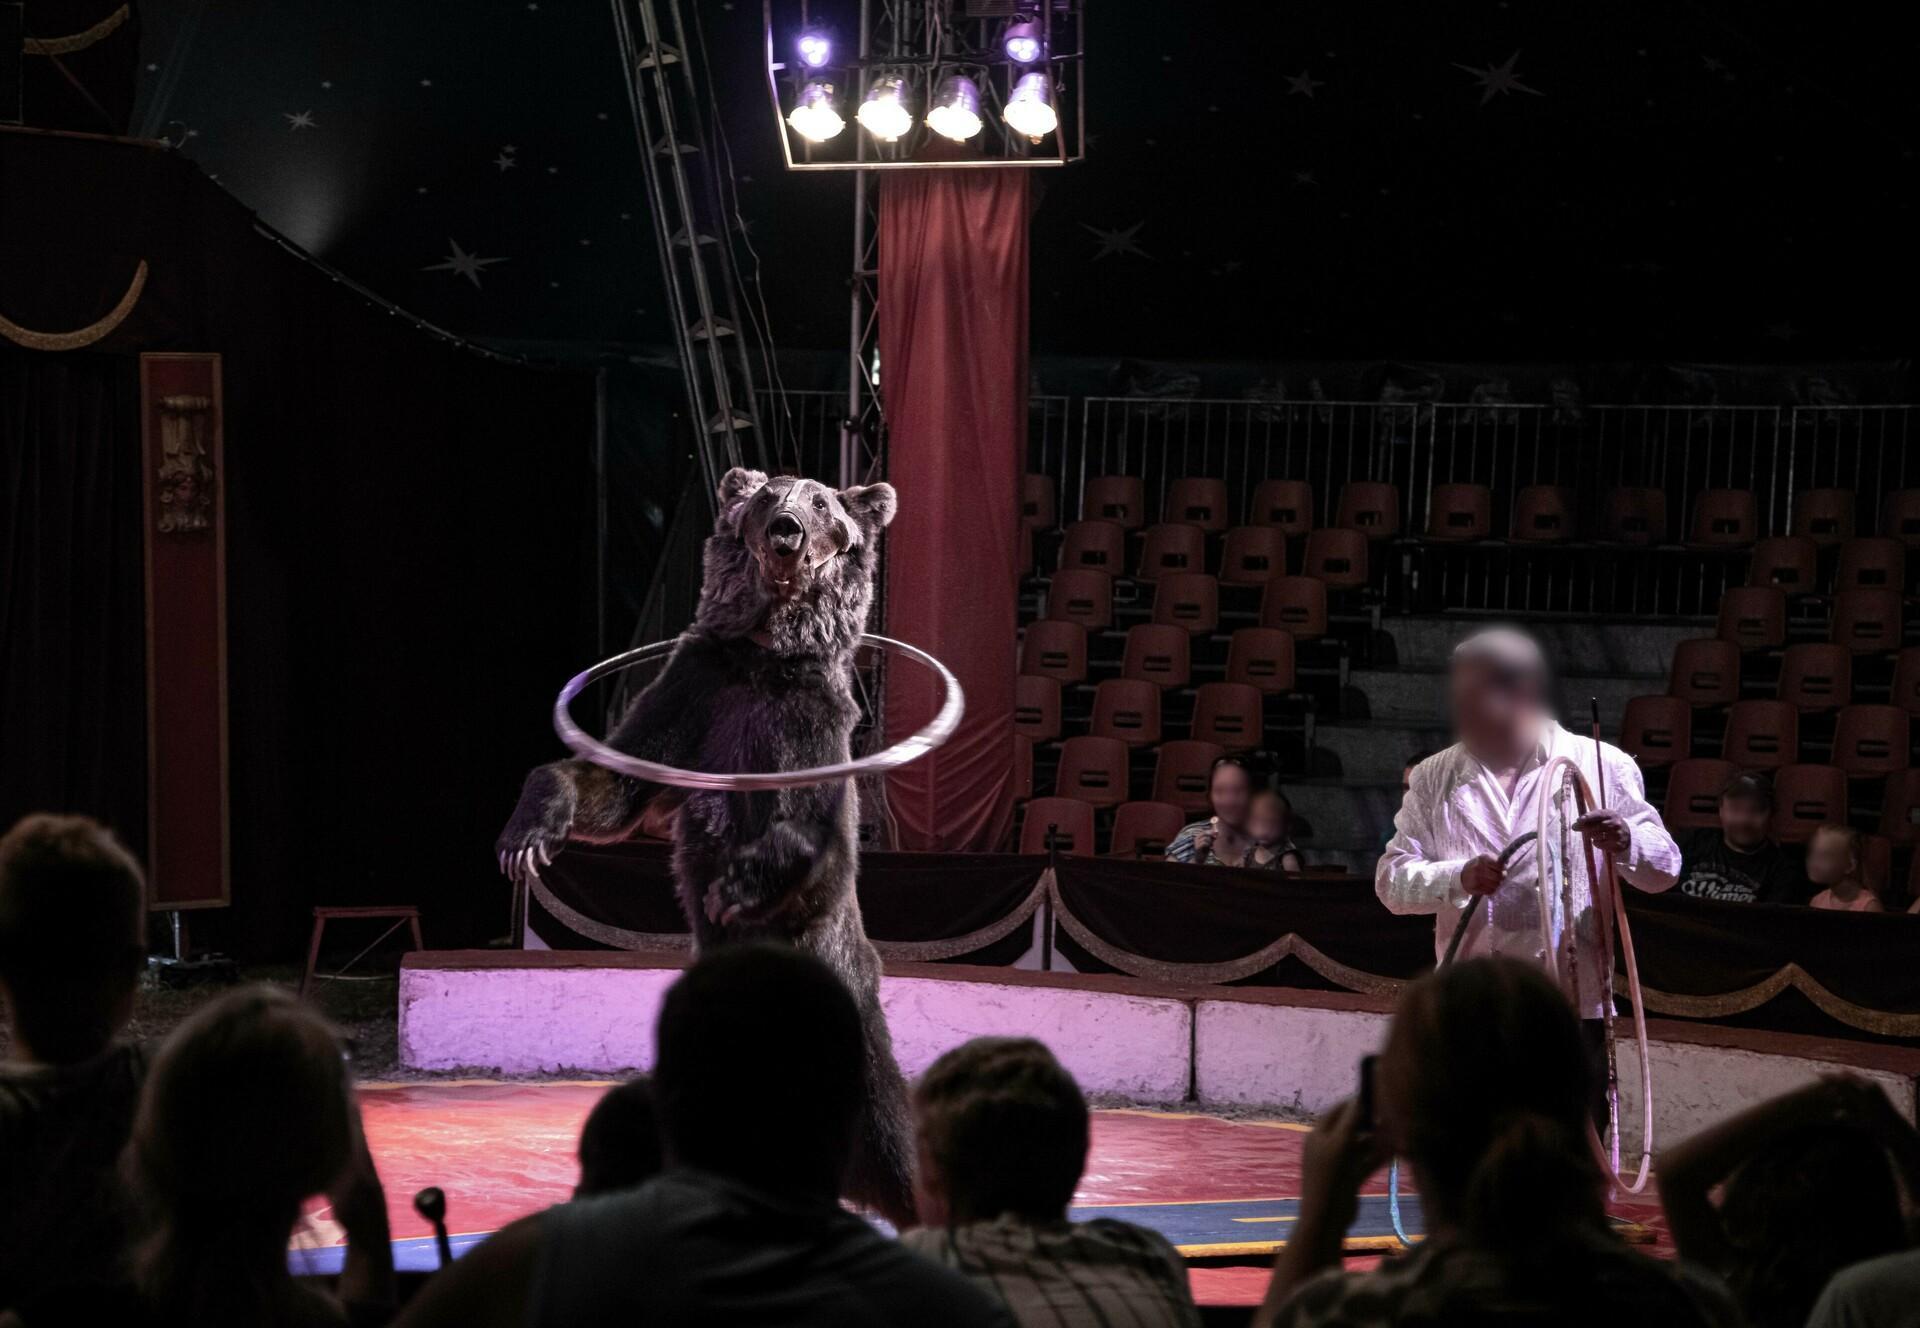 Bear in a Circus